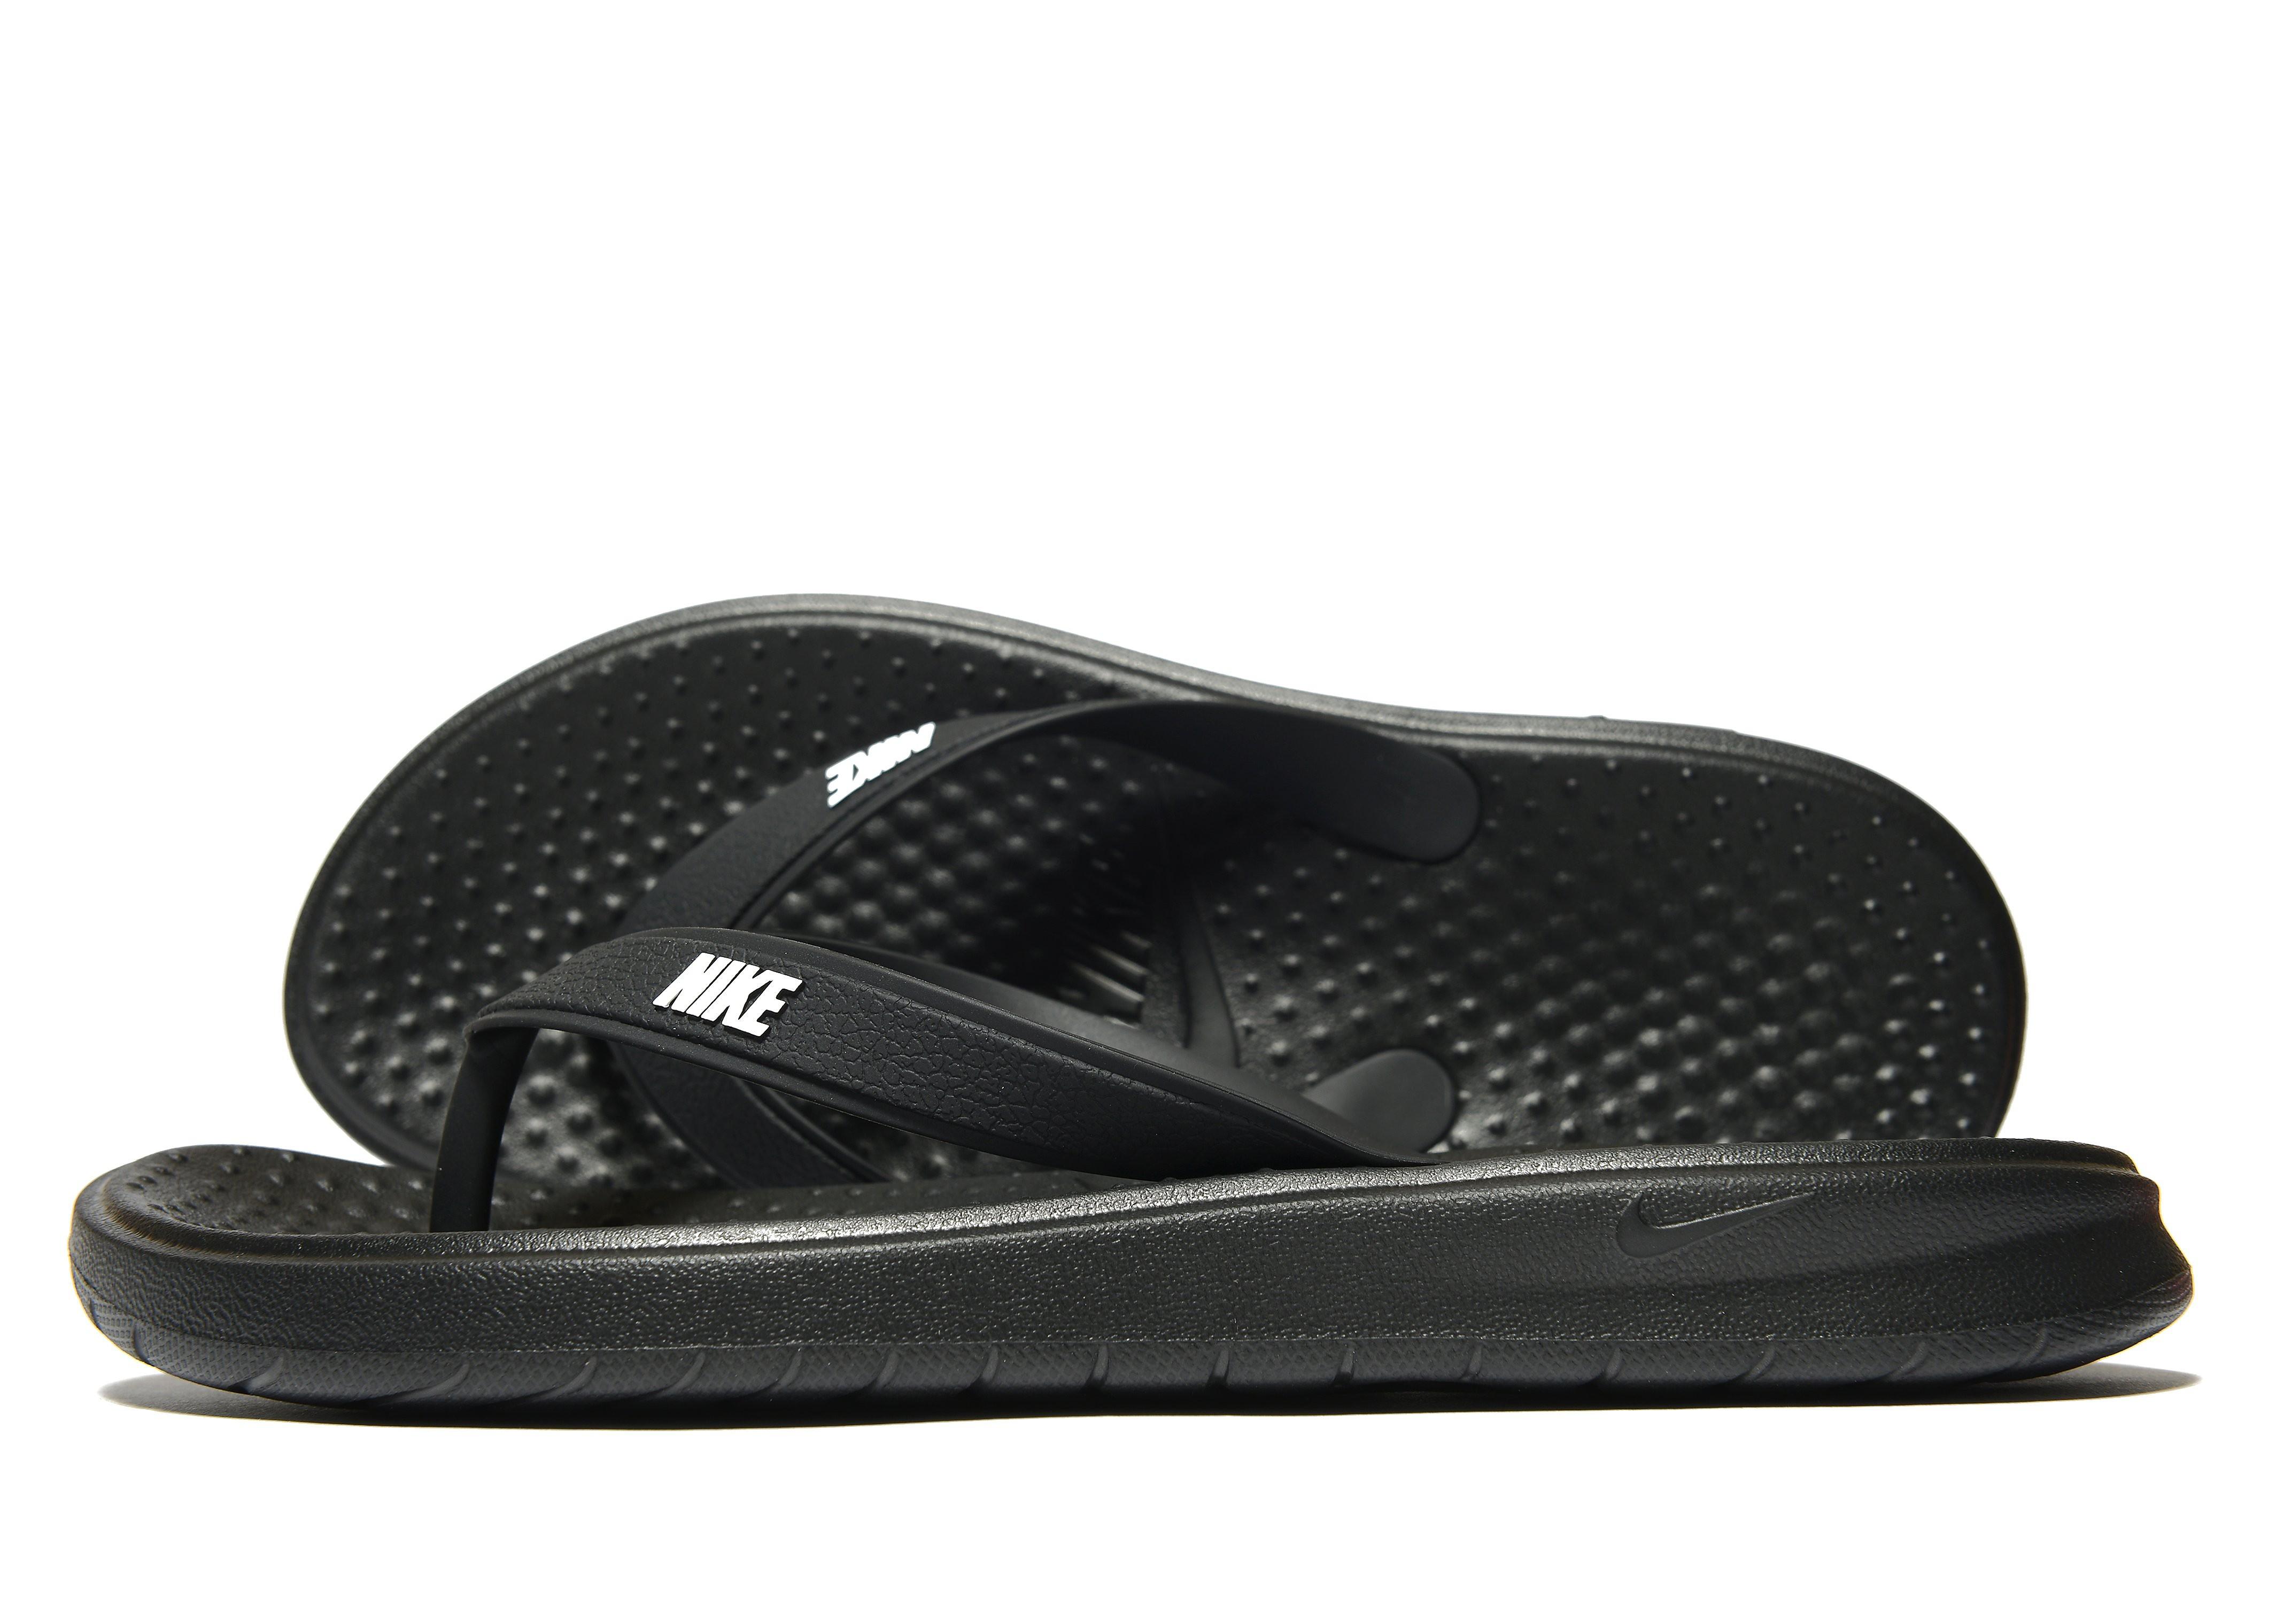 Nike Solay-teenslippers - Zwart - Heren